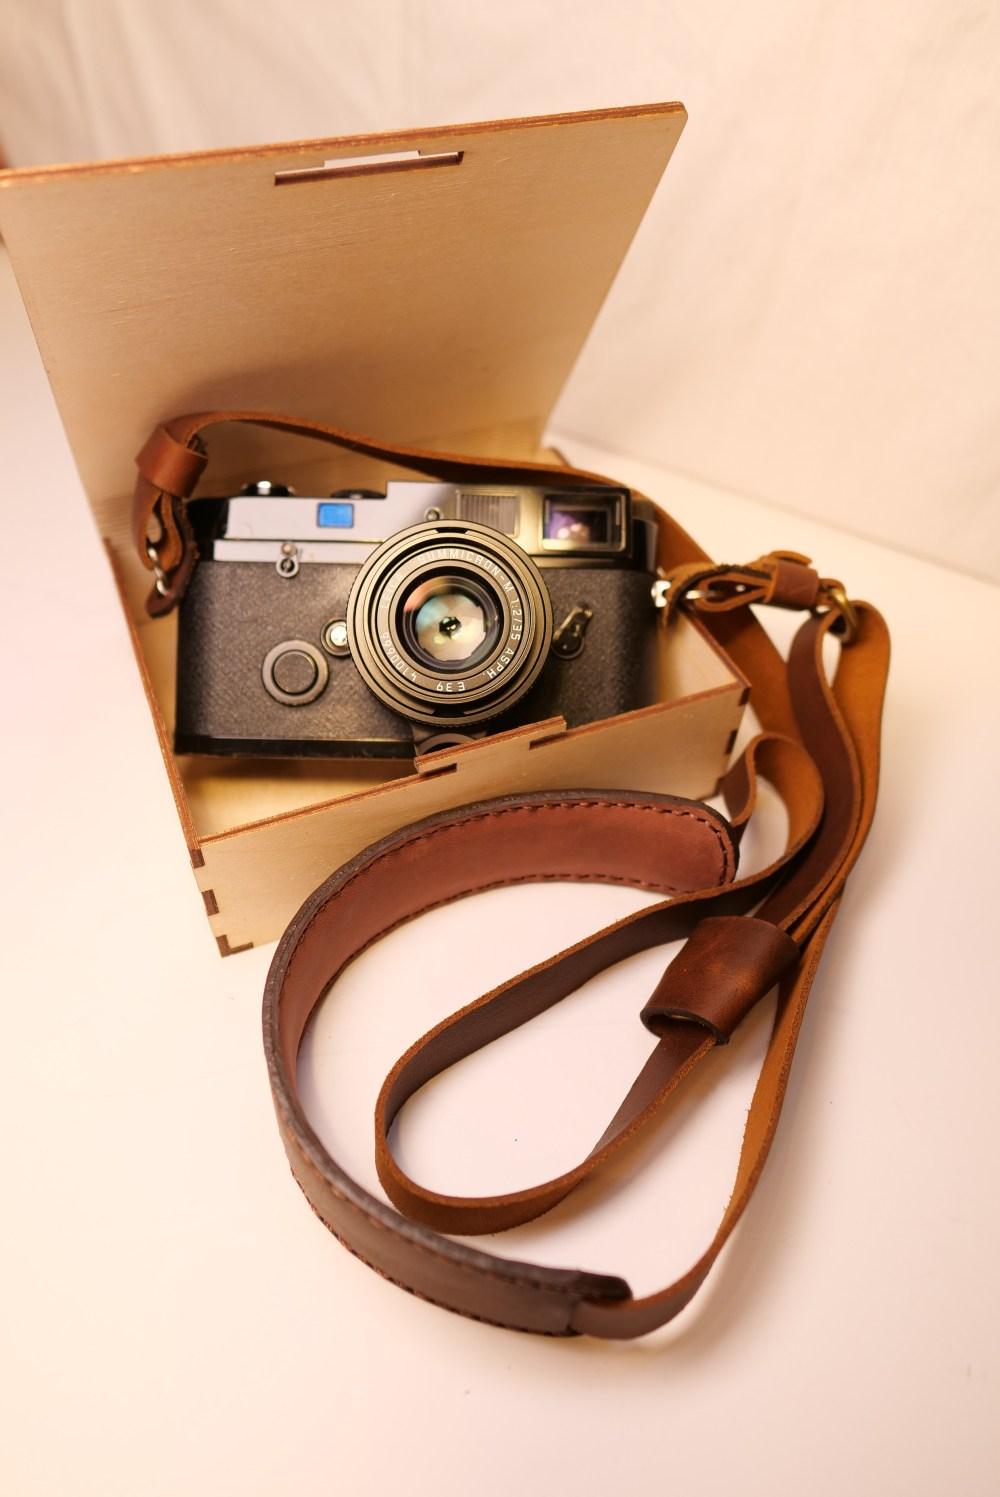 eric-kim-henri-shoulder-strap-crema-brown-box-1068696.jpg